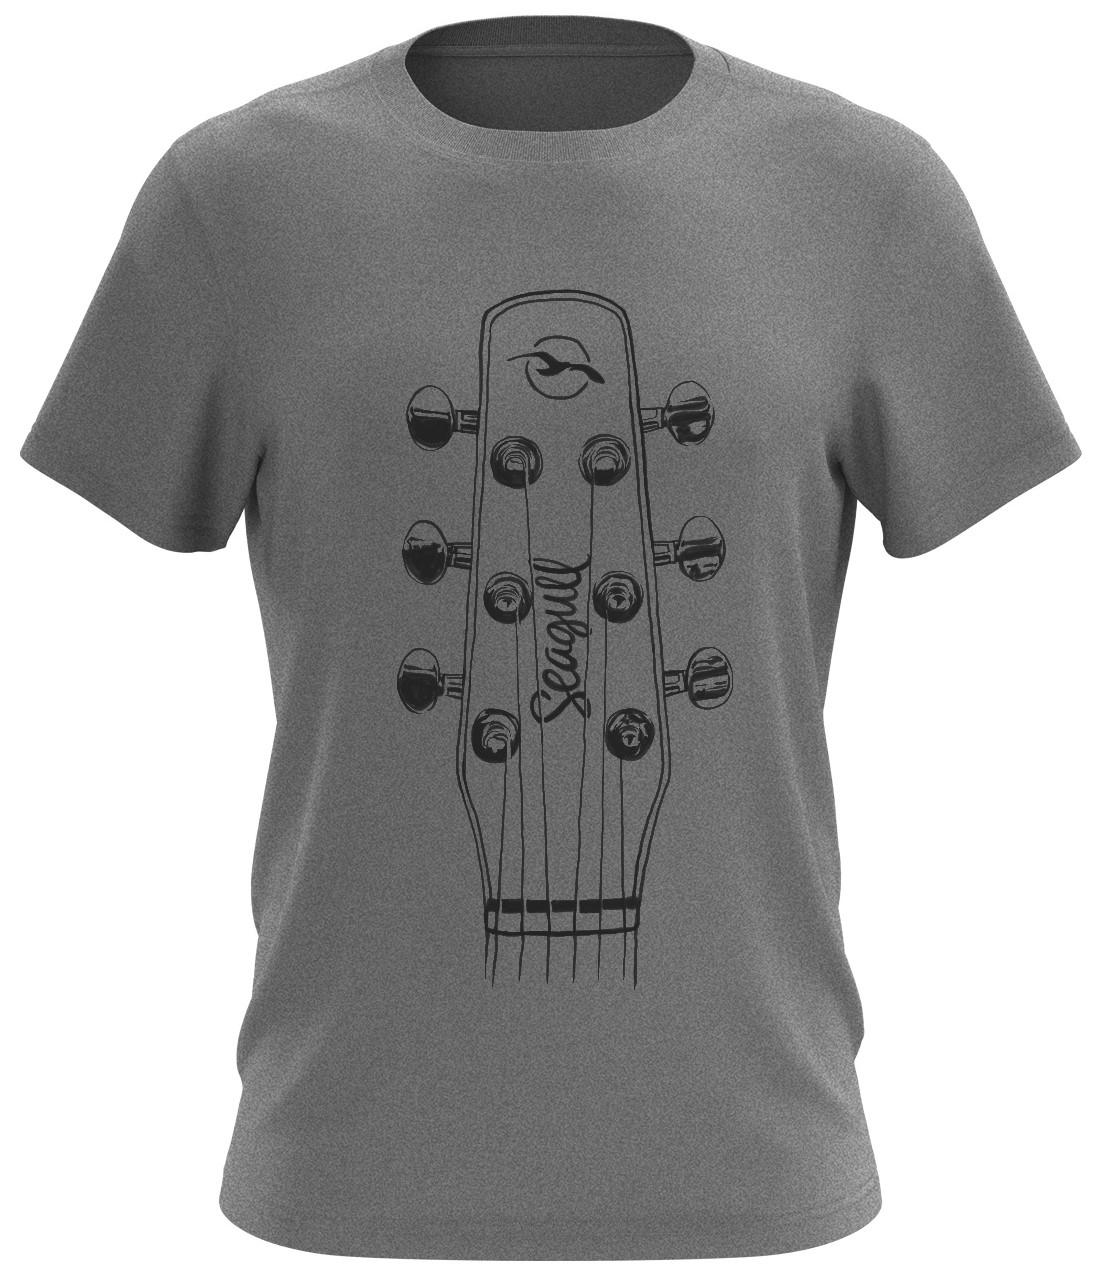 SEAGULL Headstock T-Shirt XL